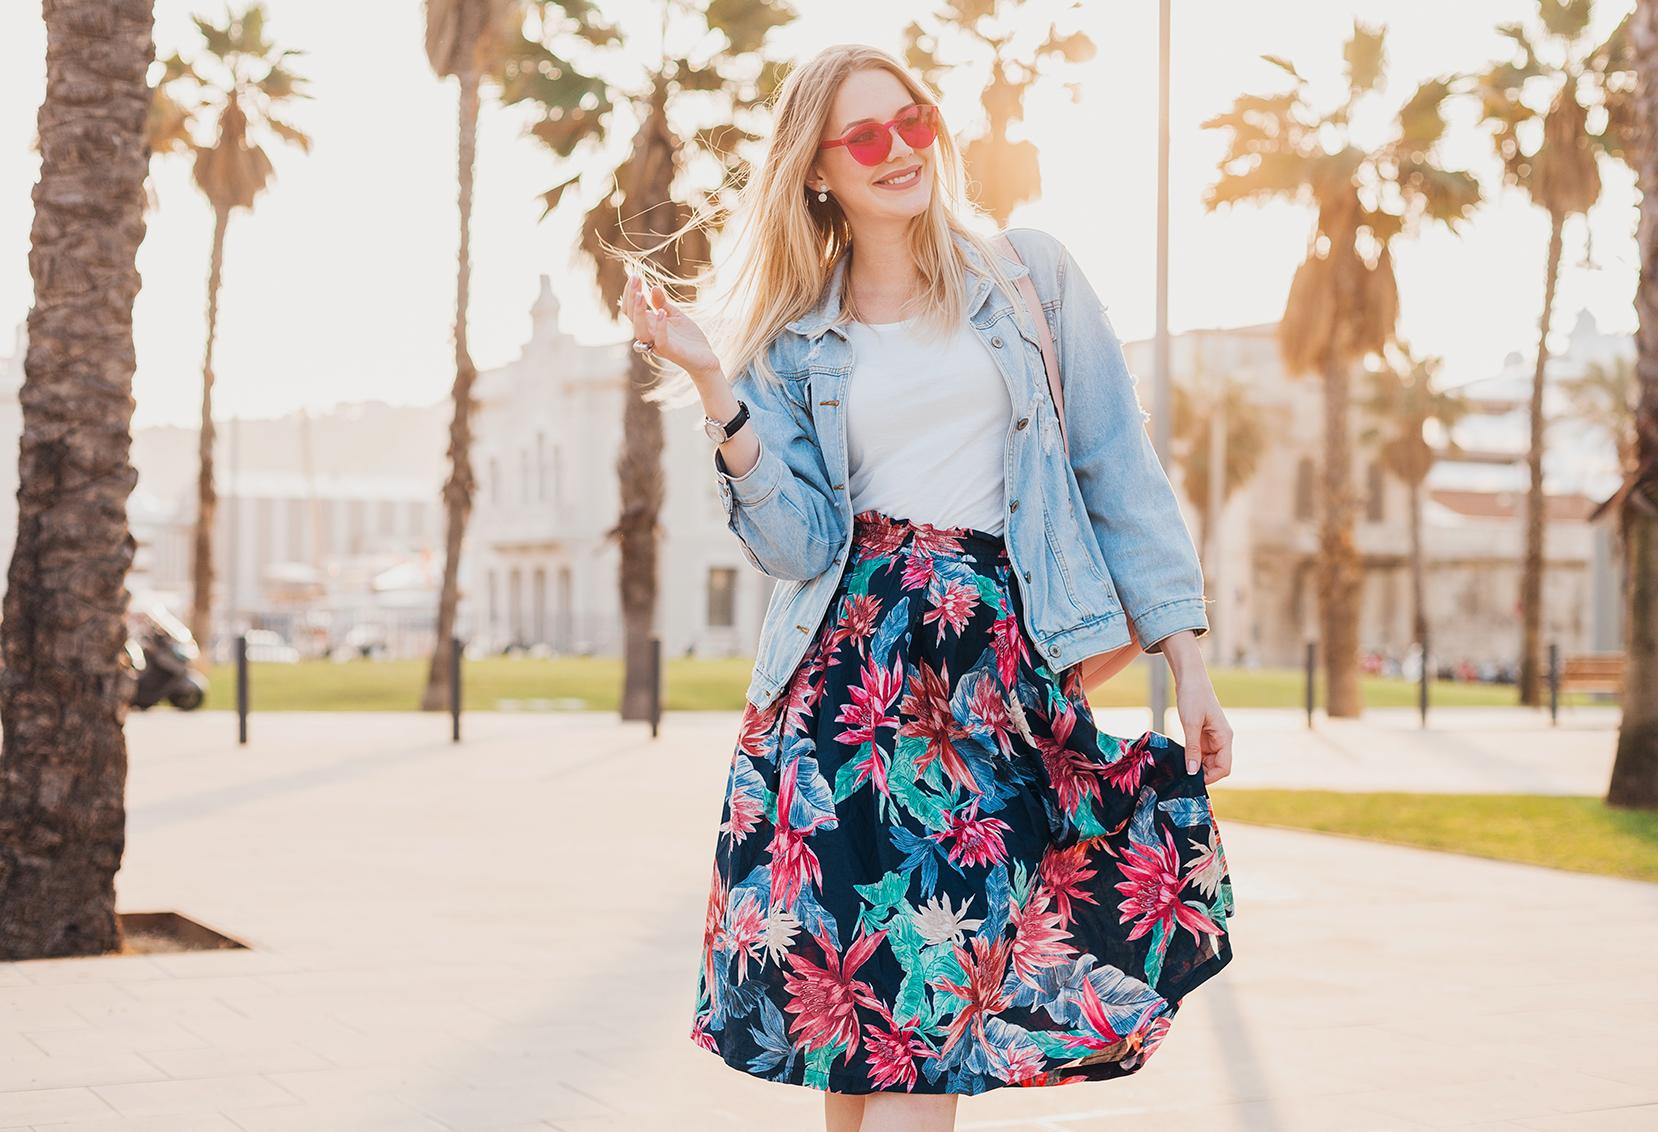 Primavera : Tendências da moda